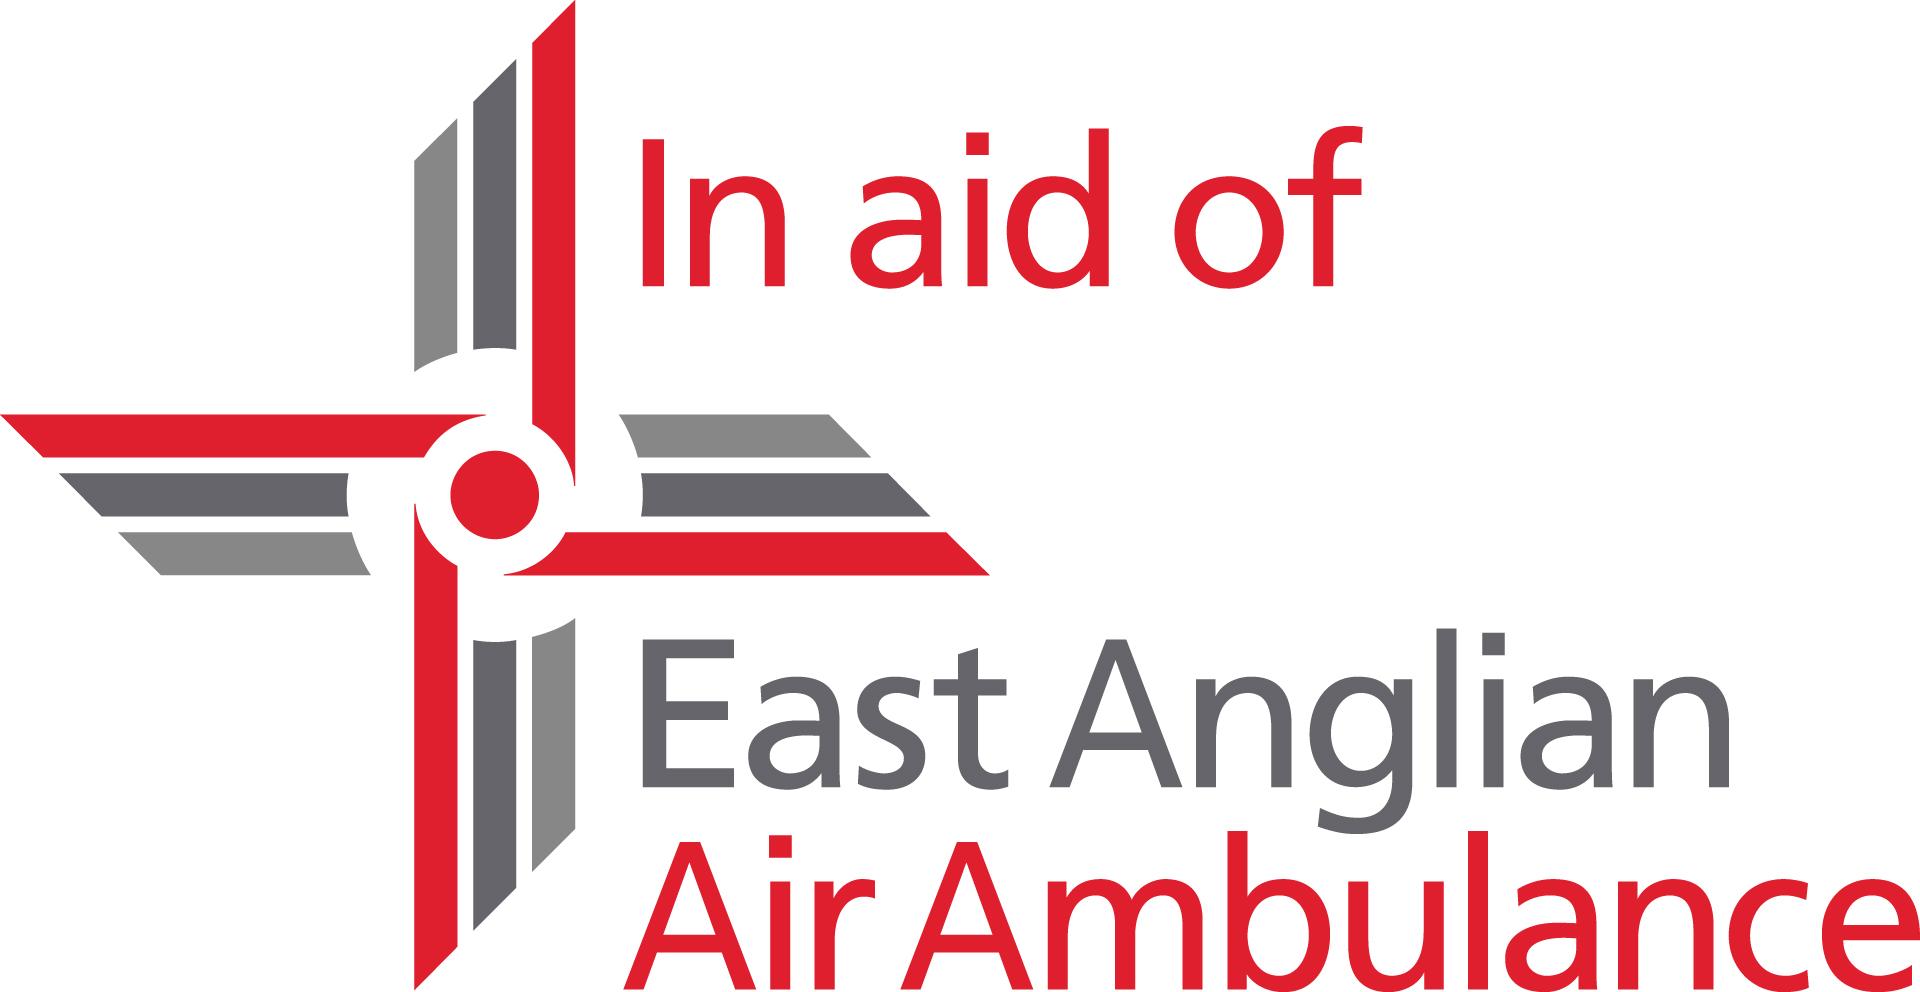 East Anglian Air Ambulance logo